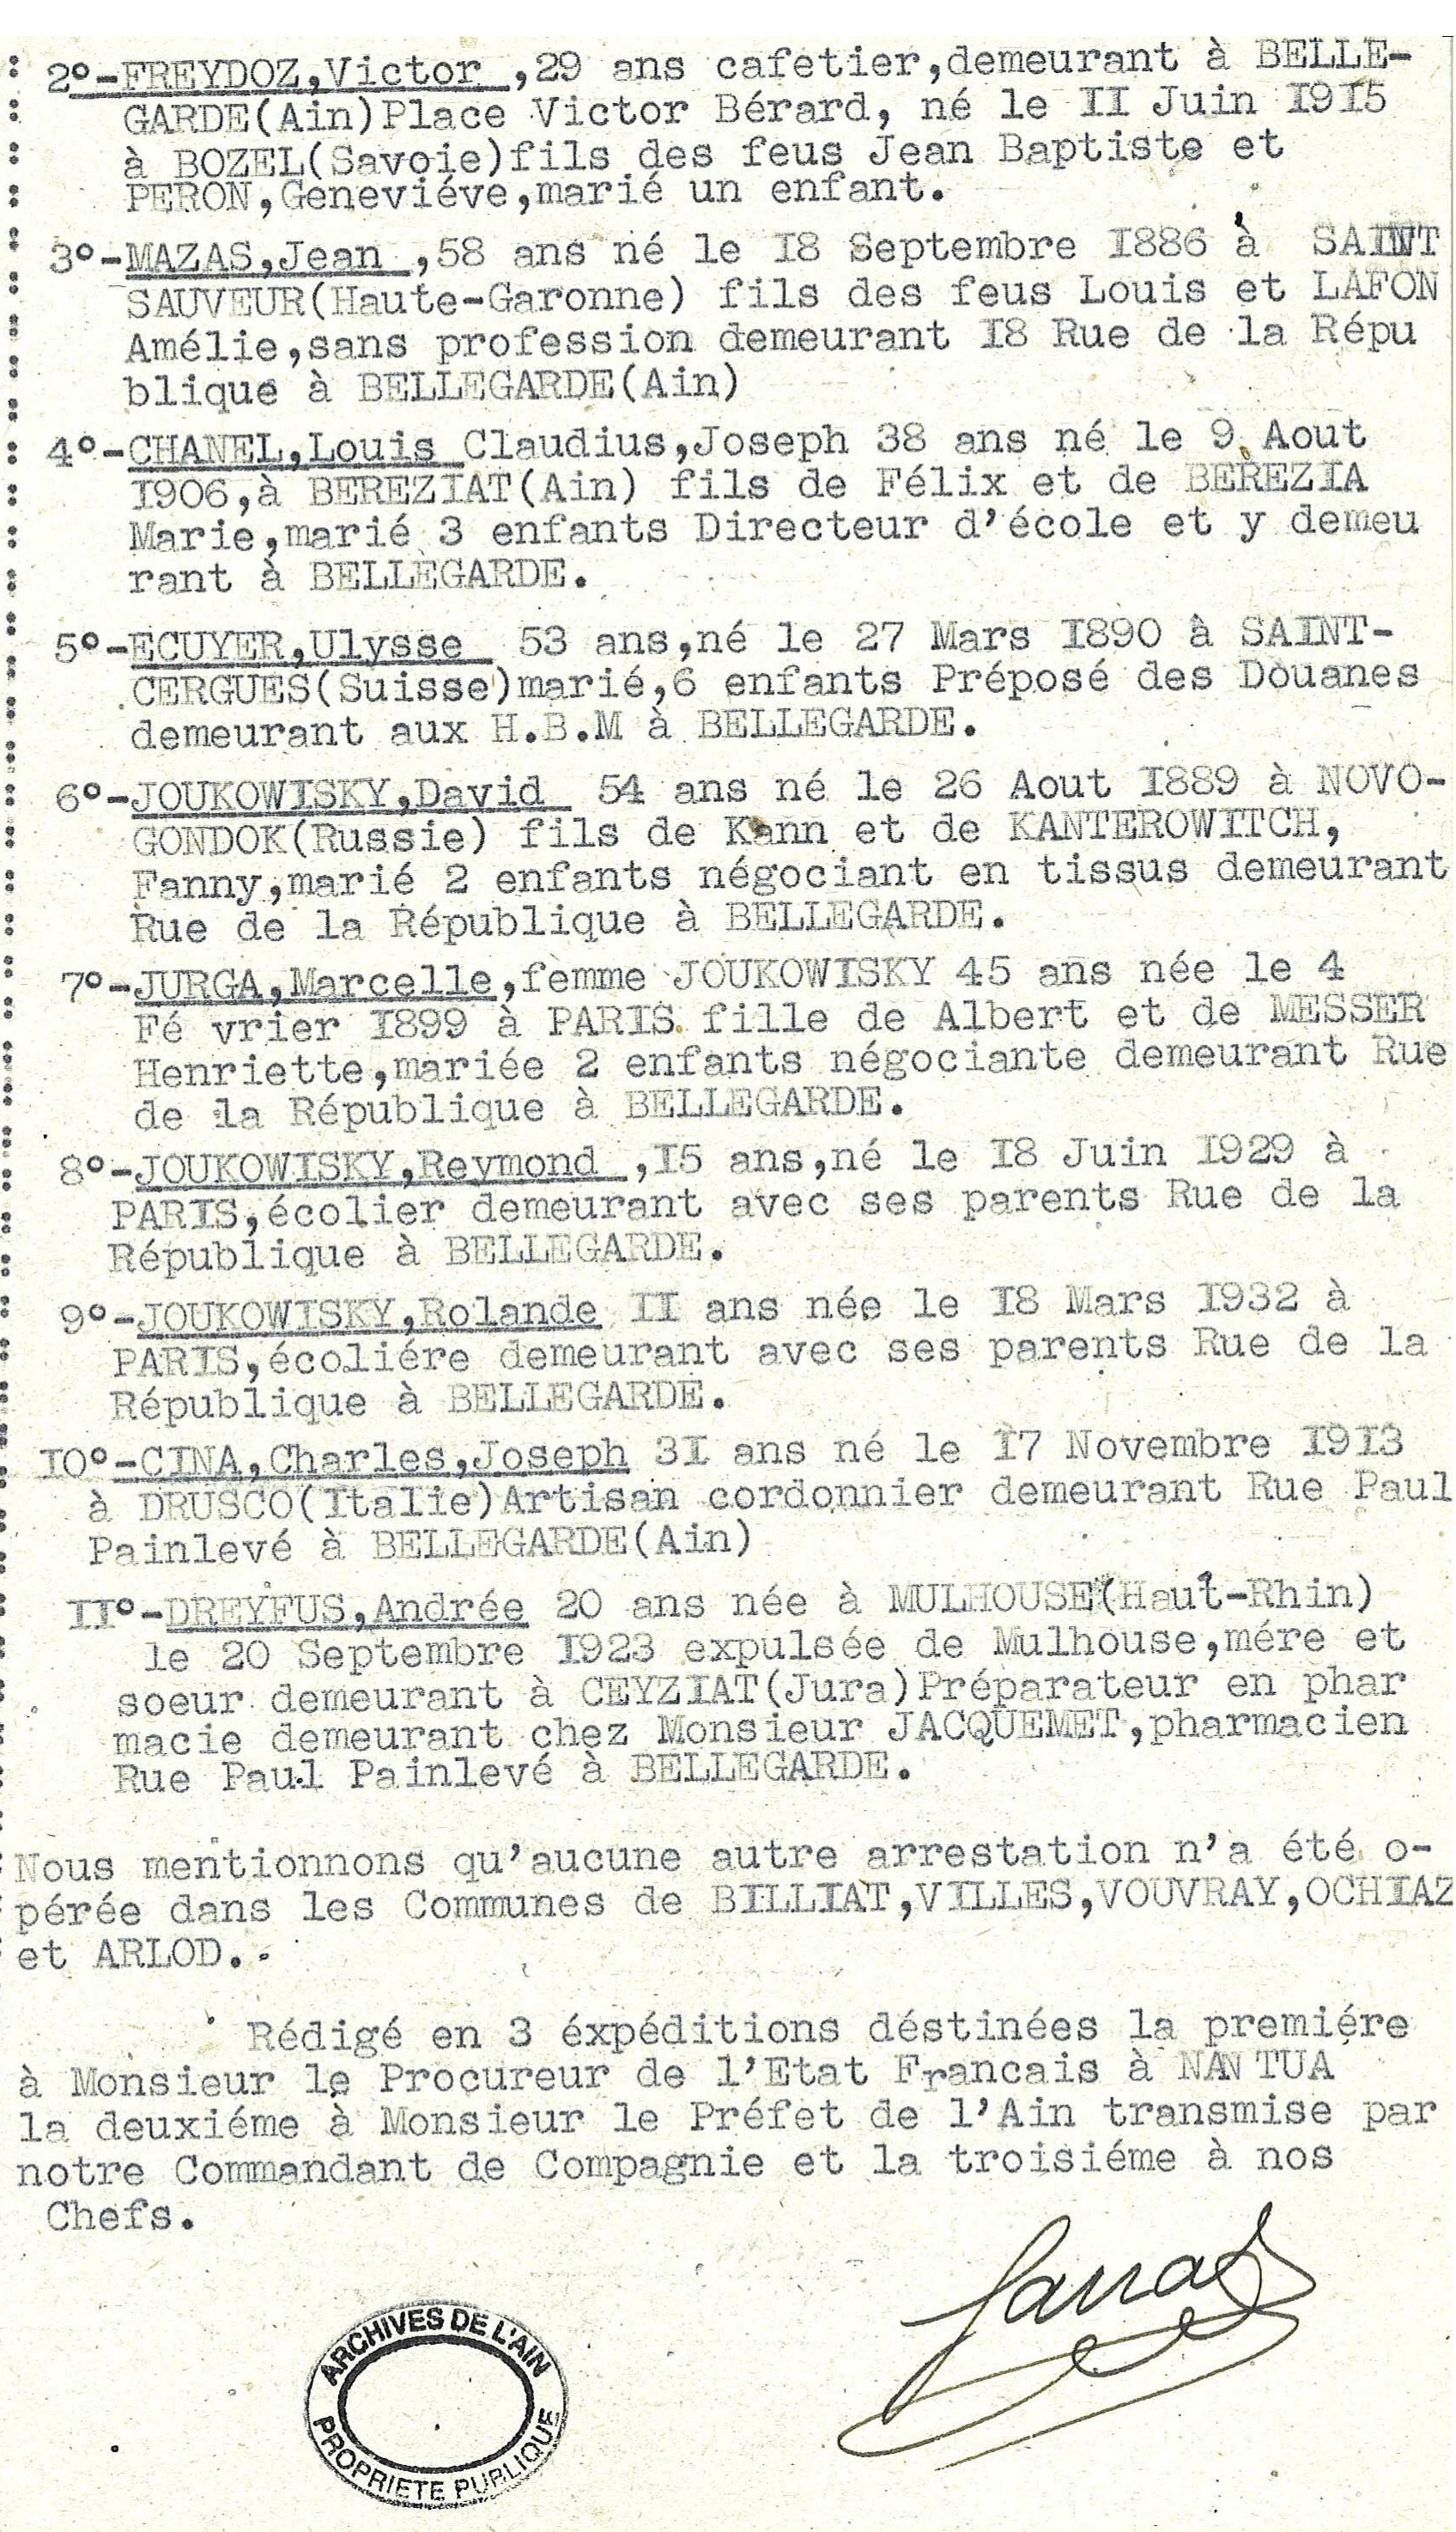 famille JOUKOWITZKI Procès-verbal de gendarmerie arrestations à Bellegarde-sur-Valserine 10-12 février 1944. b